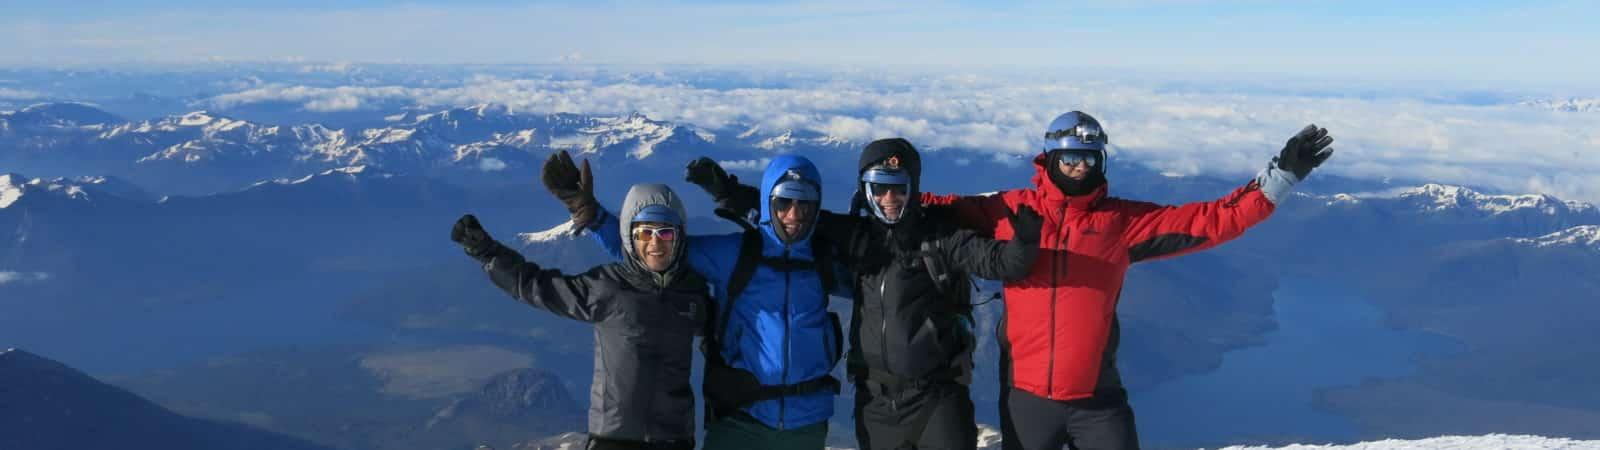 Climbing Lanin Volcano, 3776m